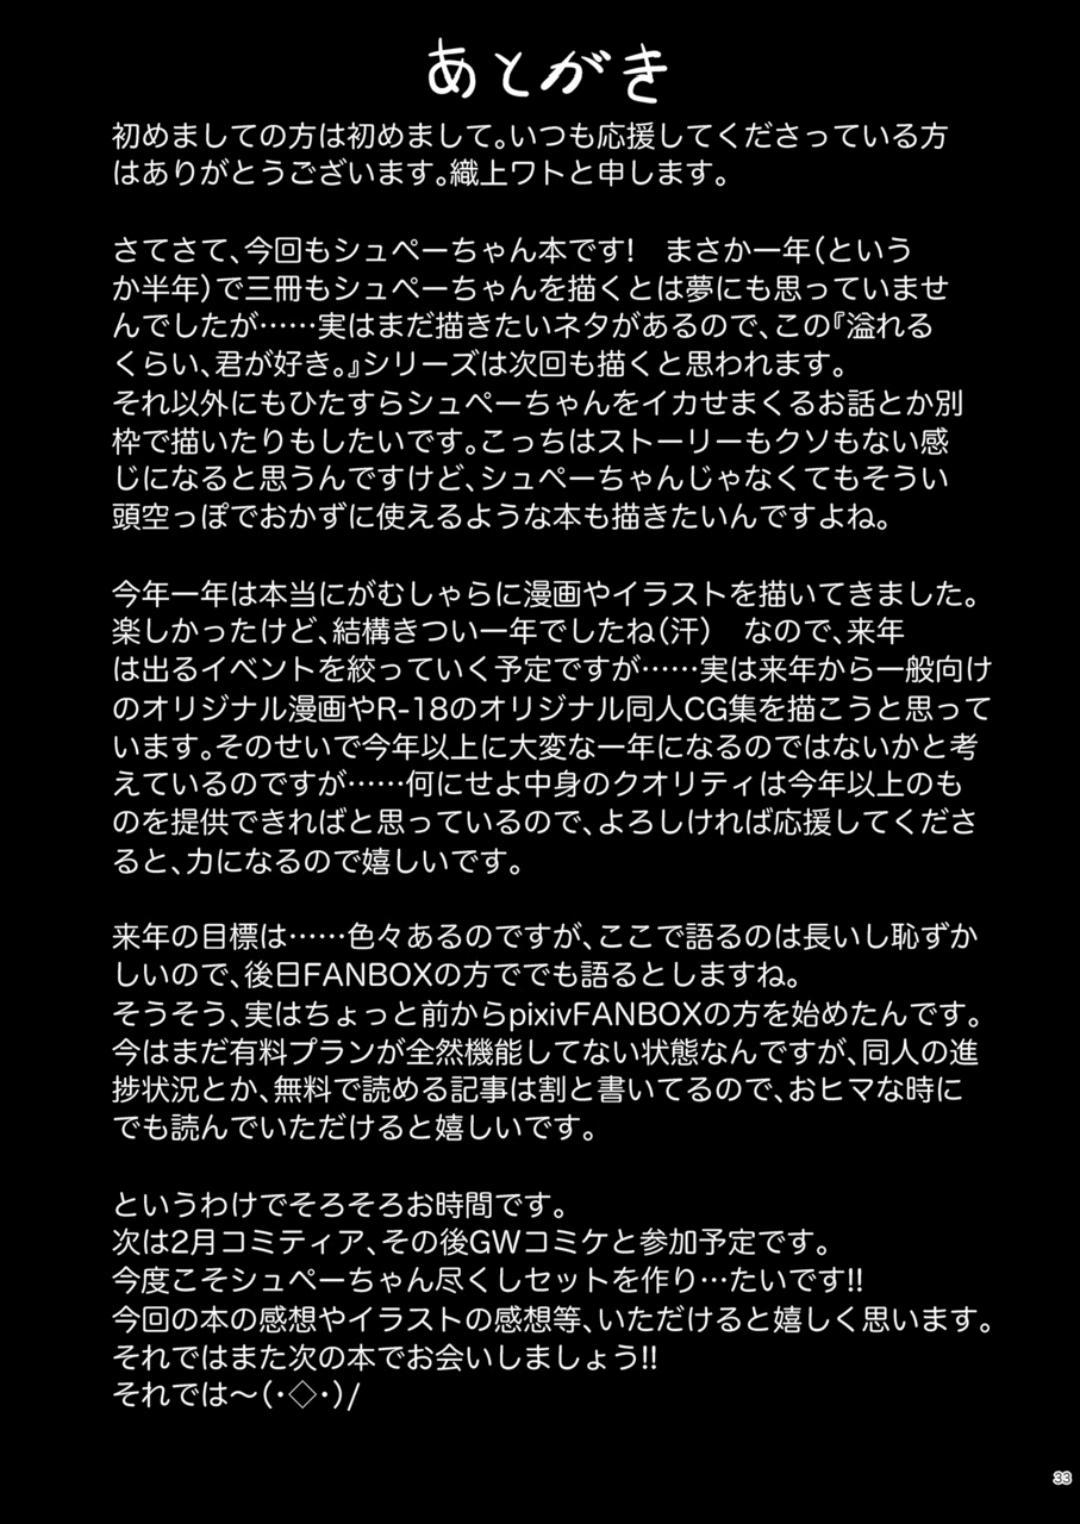 Afureru Kurai, Kimi ga Suki. San   My Overflowing Love For You 3 32